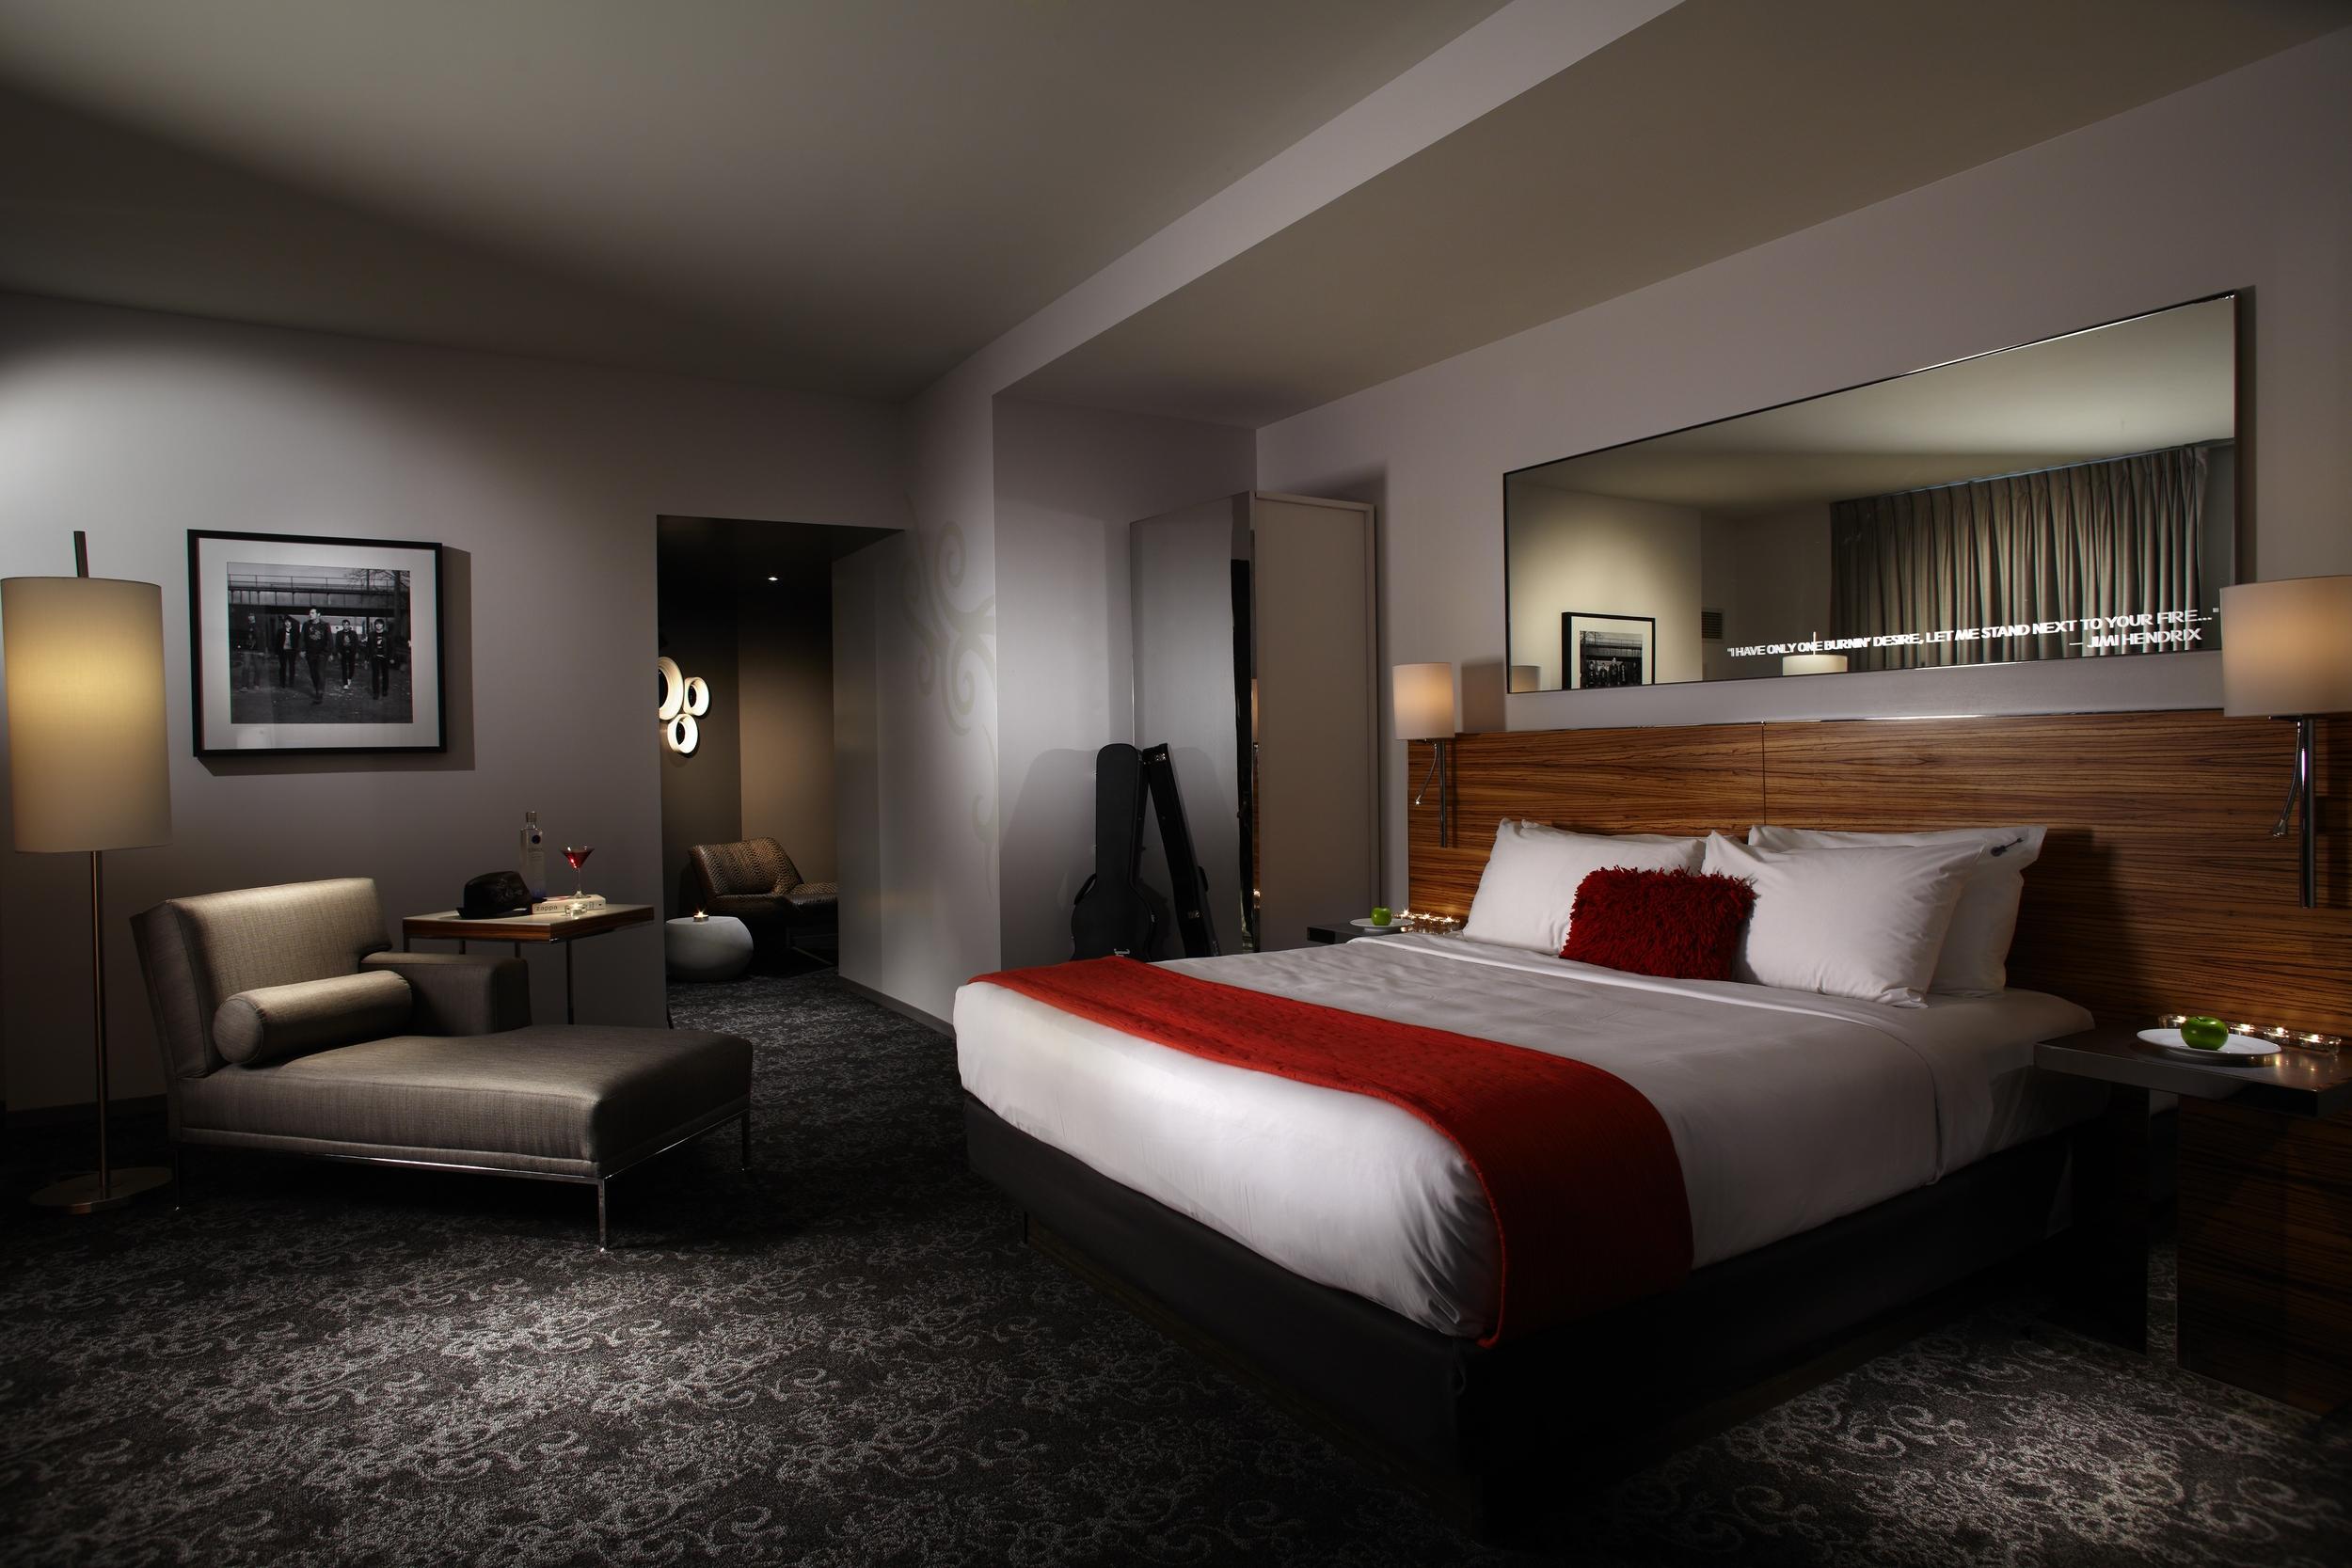 Image via: Hard Rock Hotel Chicago